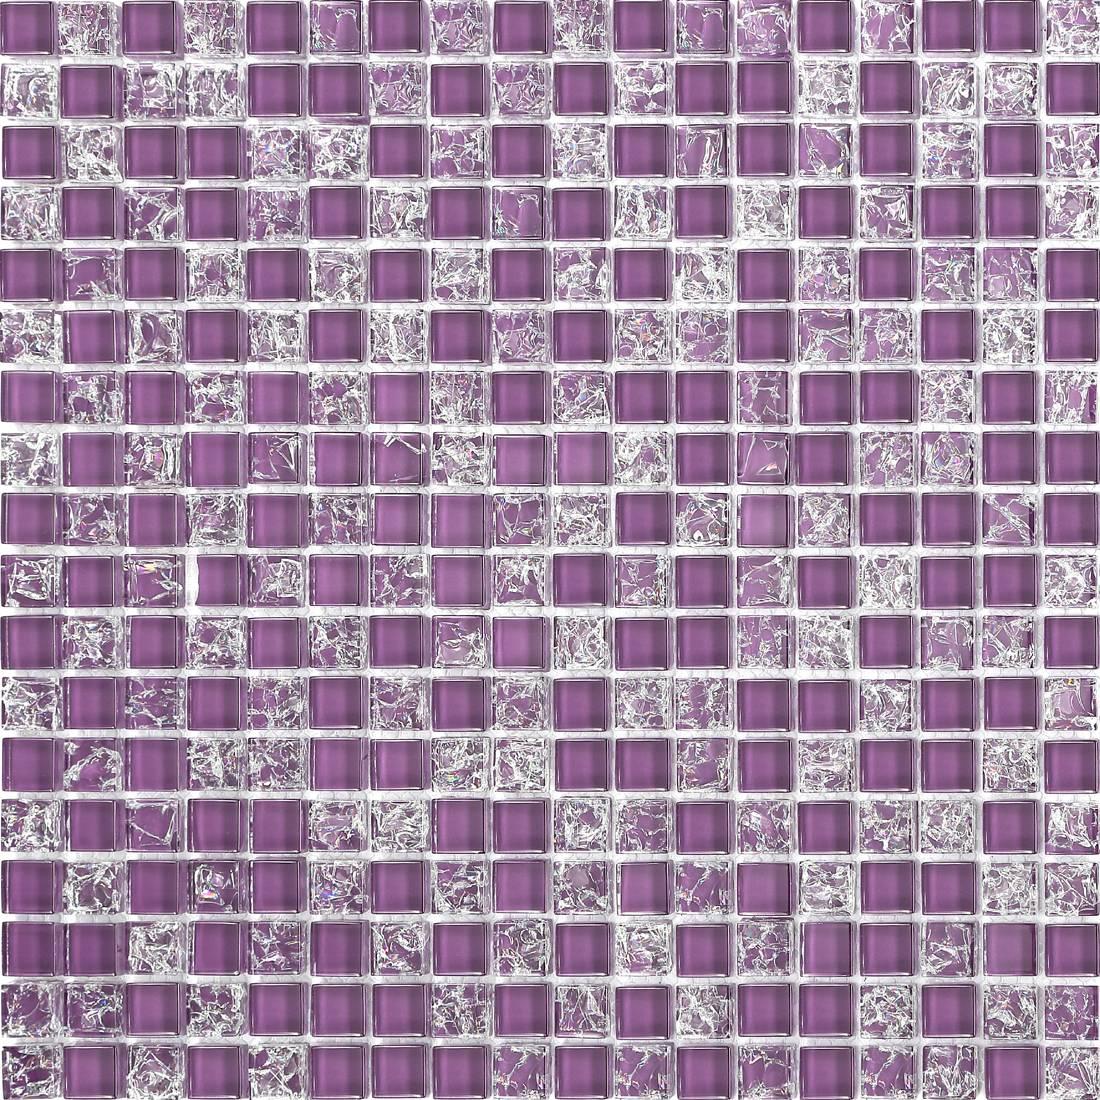 gebrochenes crackled glas mosaik fliesen matte schwarz rot. Black Bedroom Furniture Sets. Home Design Ideas